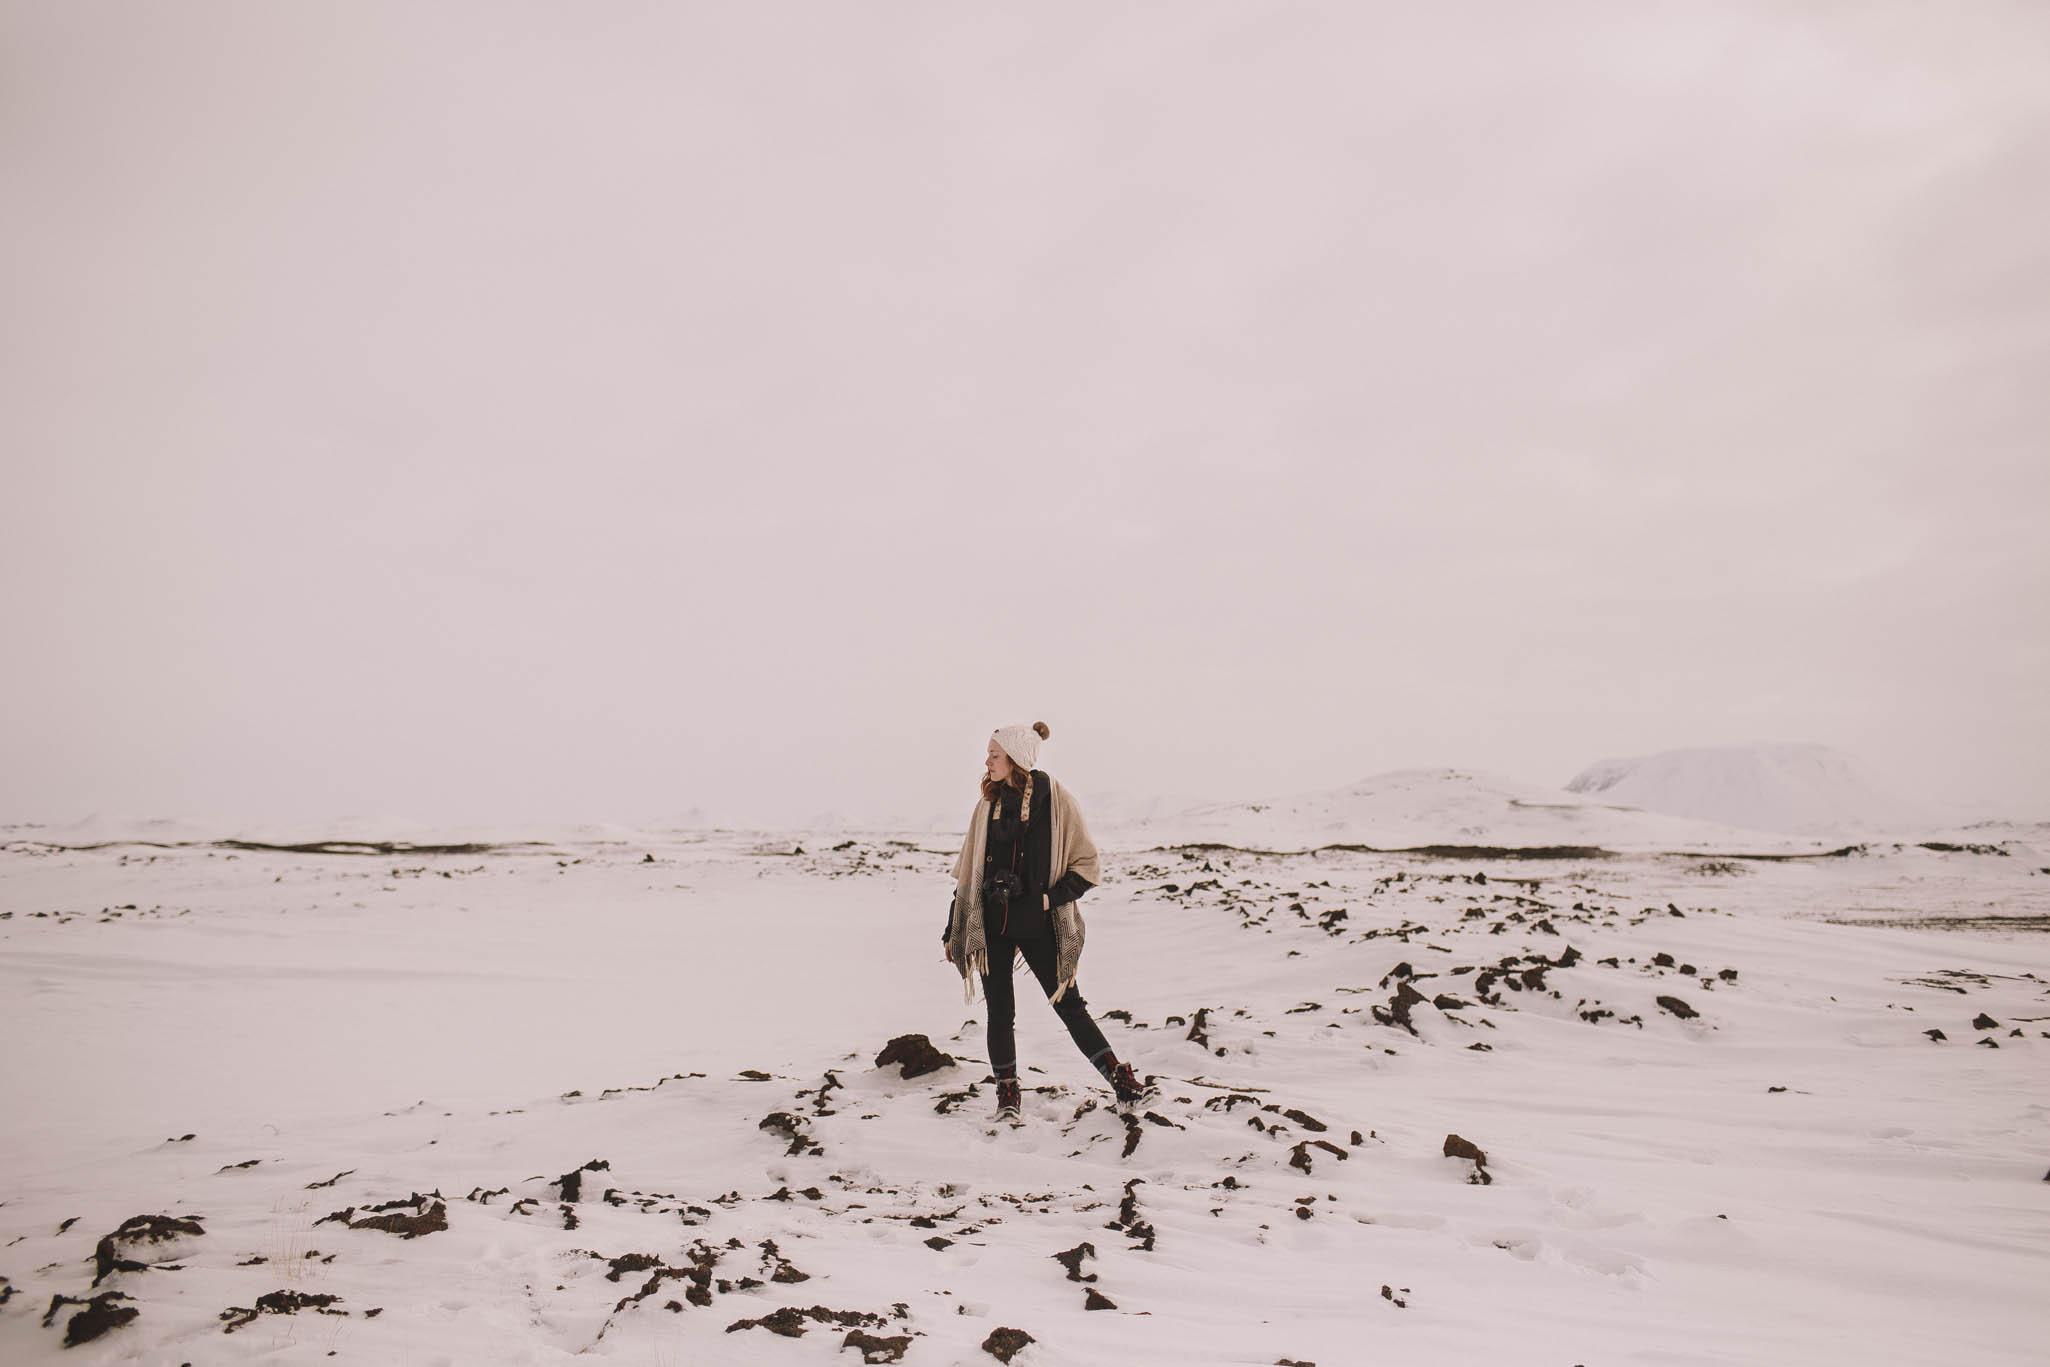 Road-trip-Islande-Iceland-Voyage-Travel-Portrait-Jérémy-Boyer-Hverir-Steam-mountains-montagnes-vapeur-18.jpg